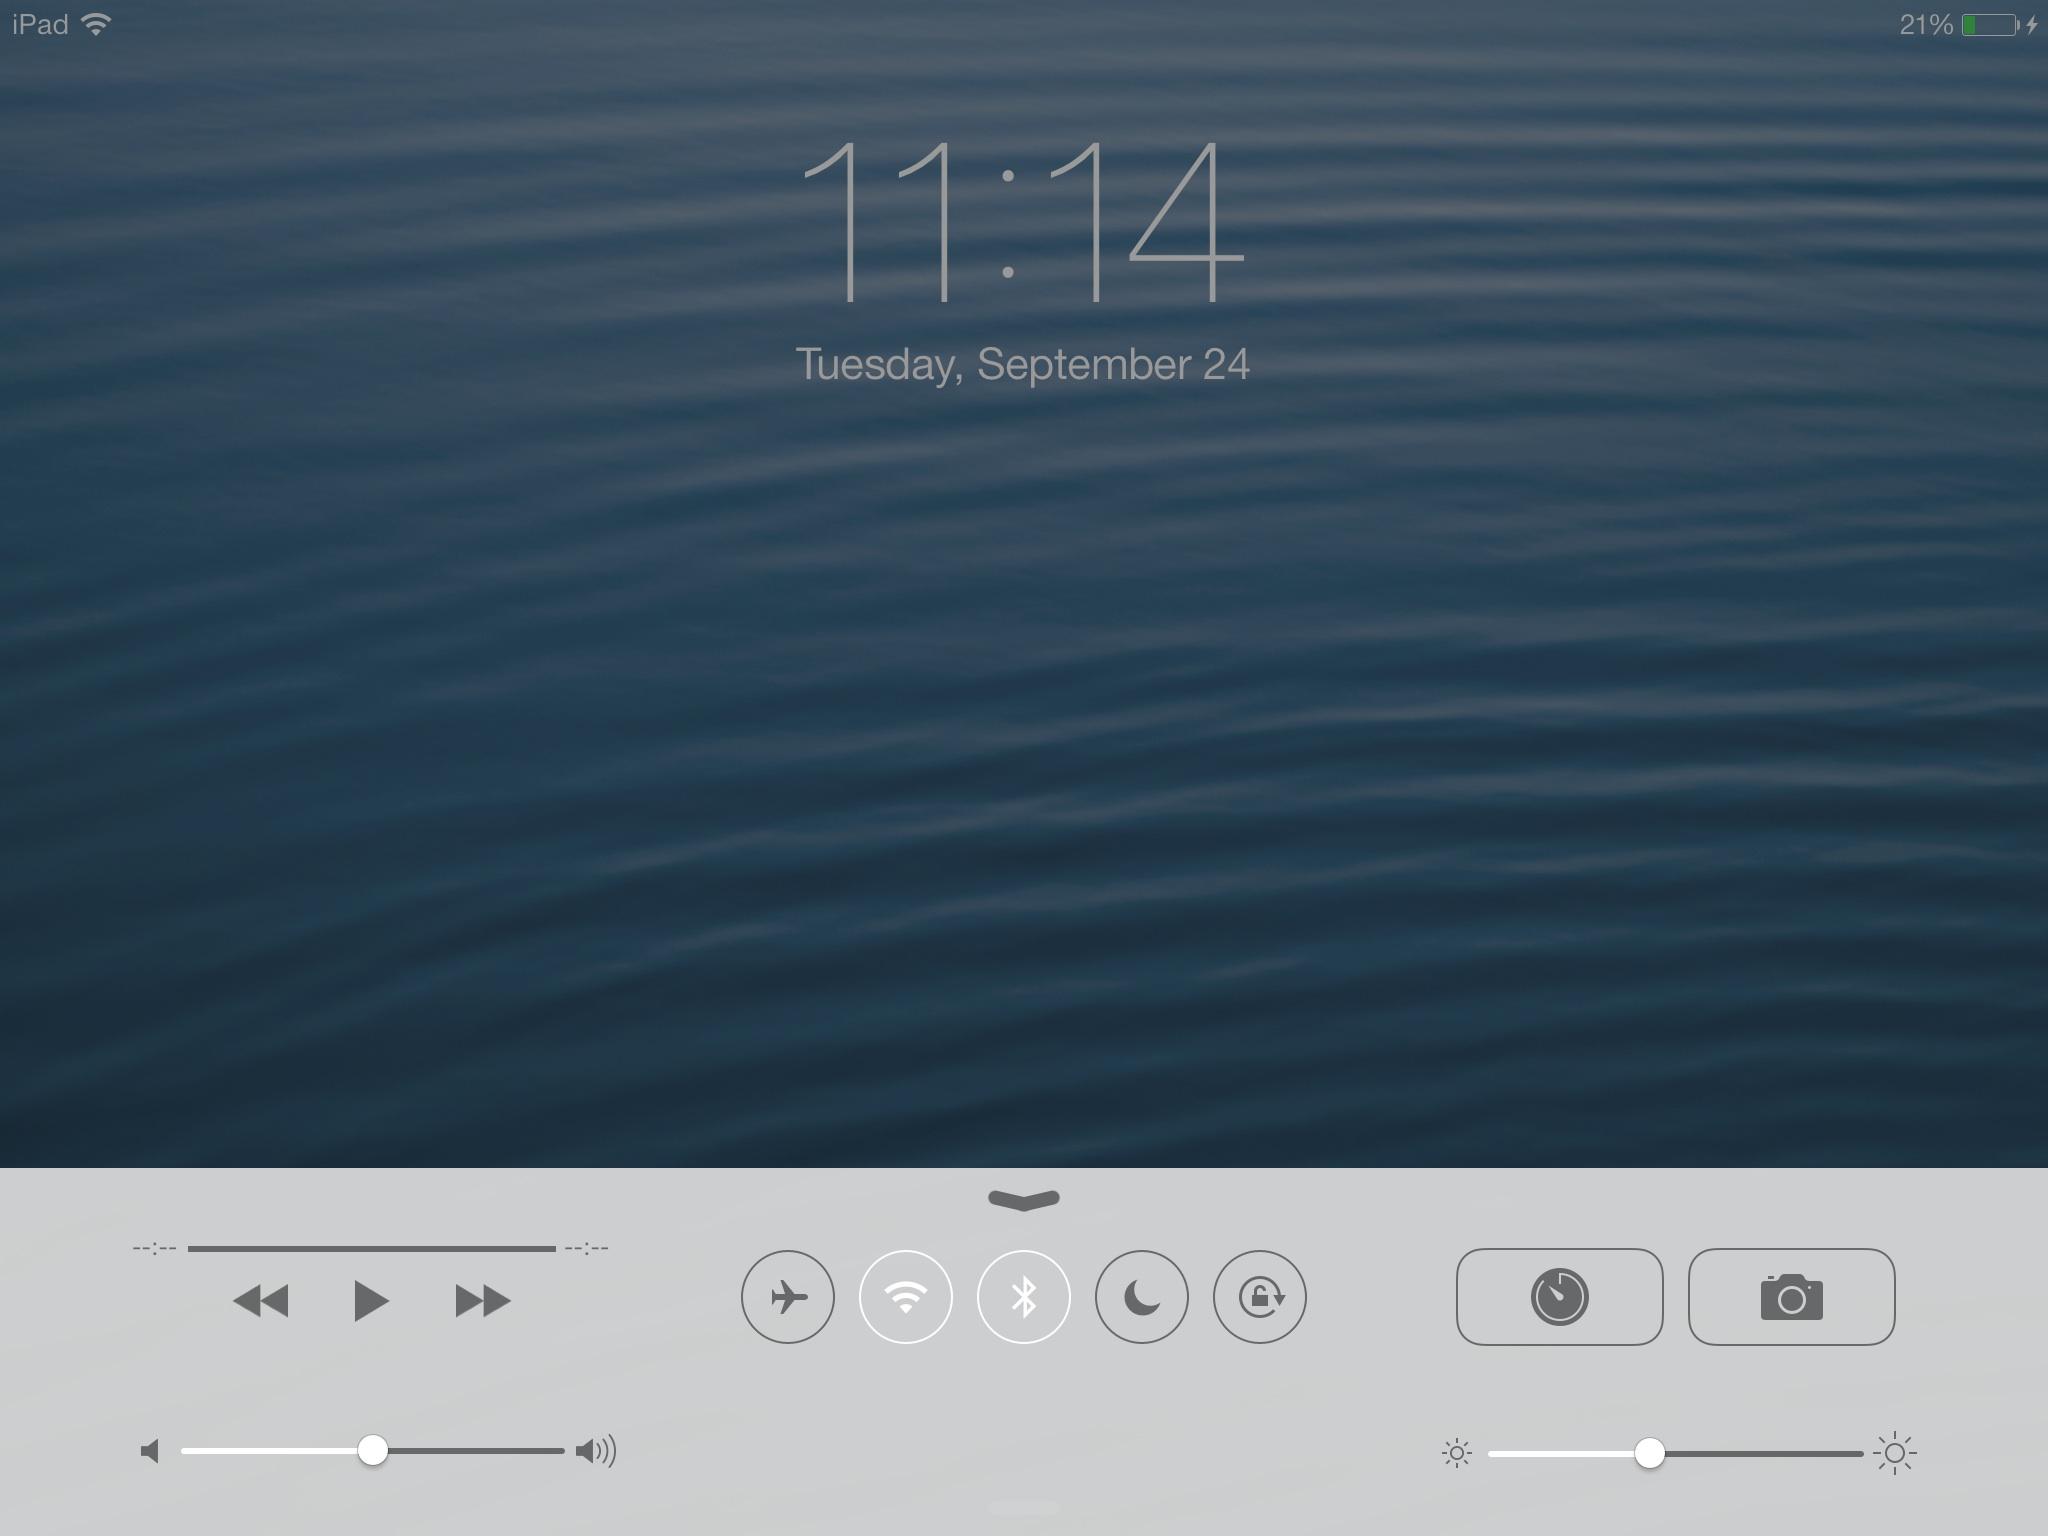 KB0014 - Lock screen rotation on an iPad (iOS 7) - Online Help